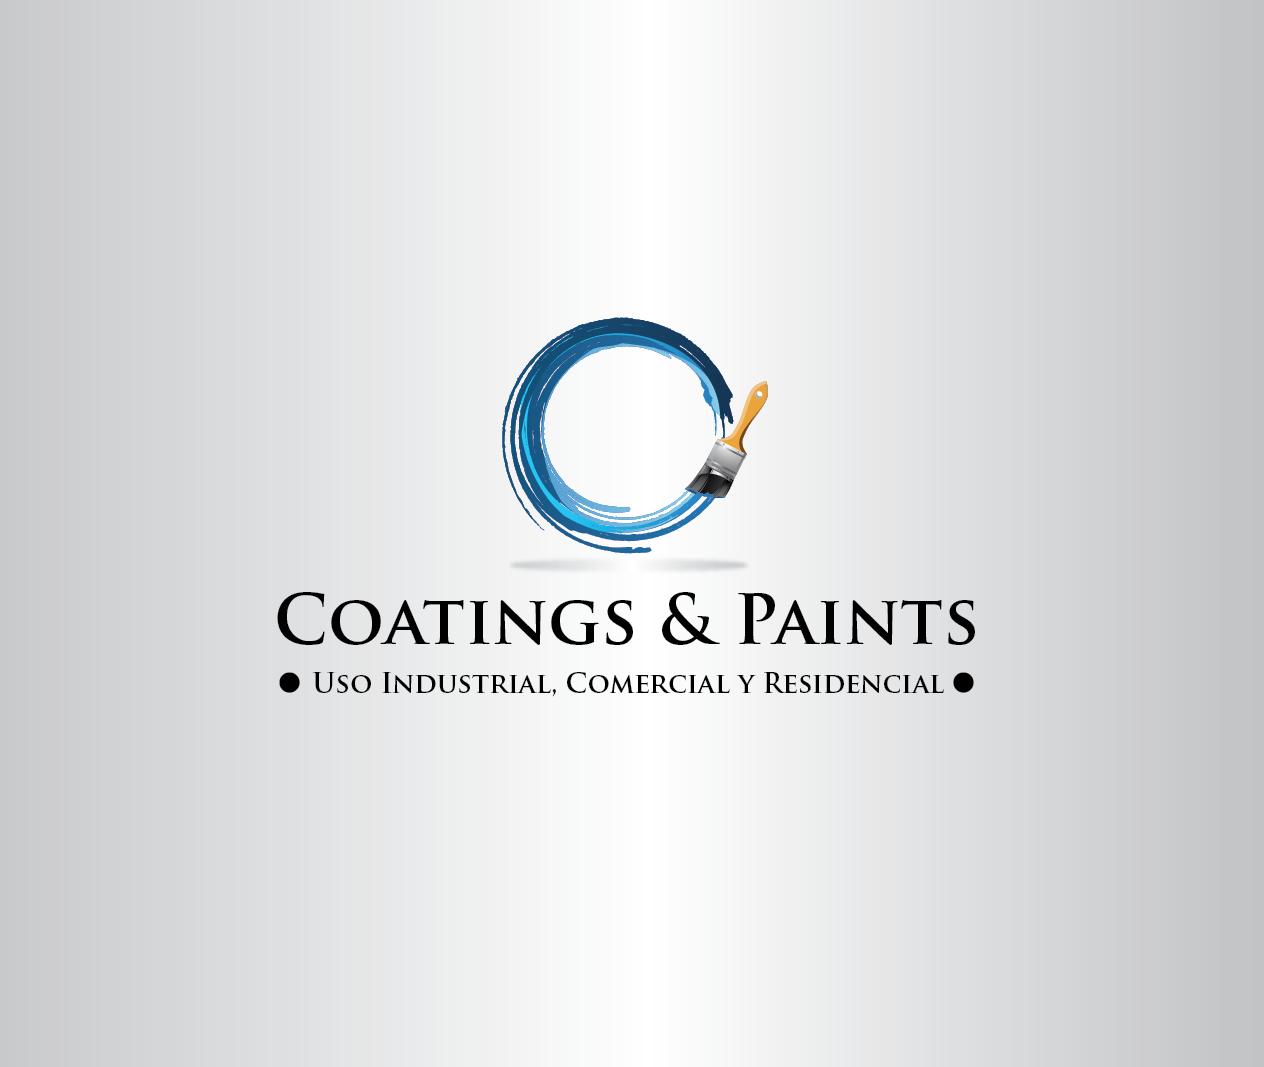 Coatings & Paints